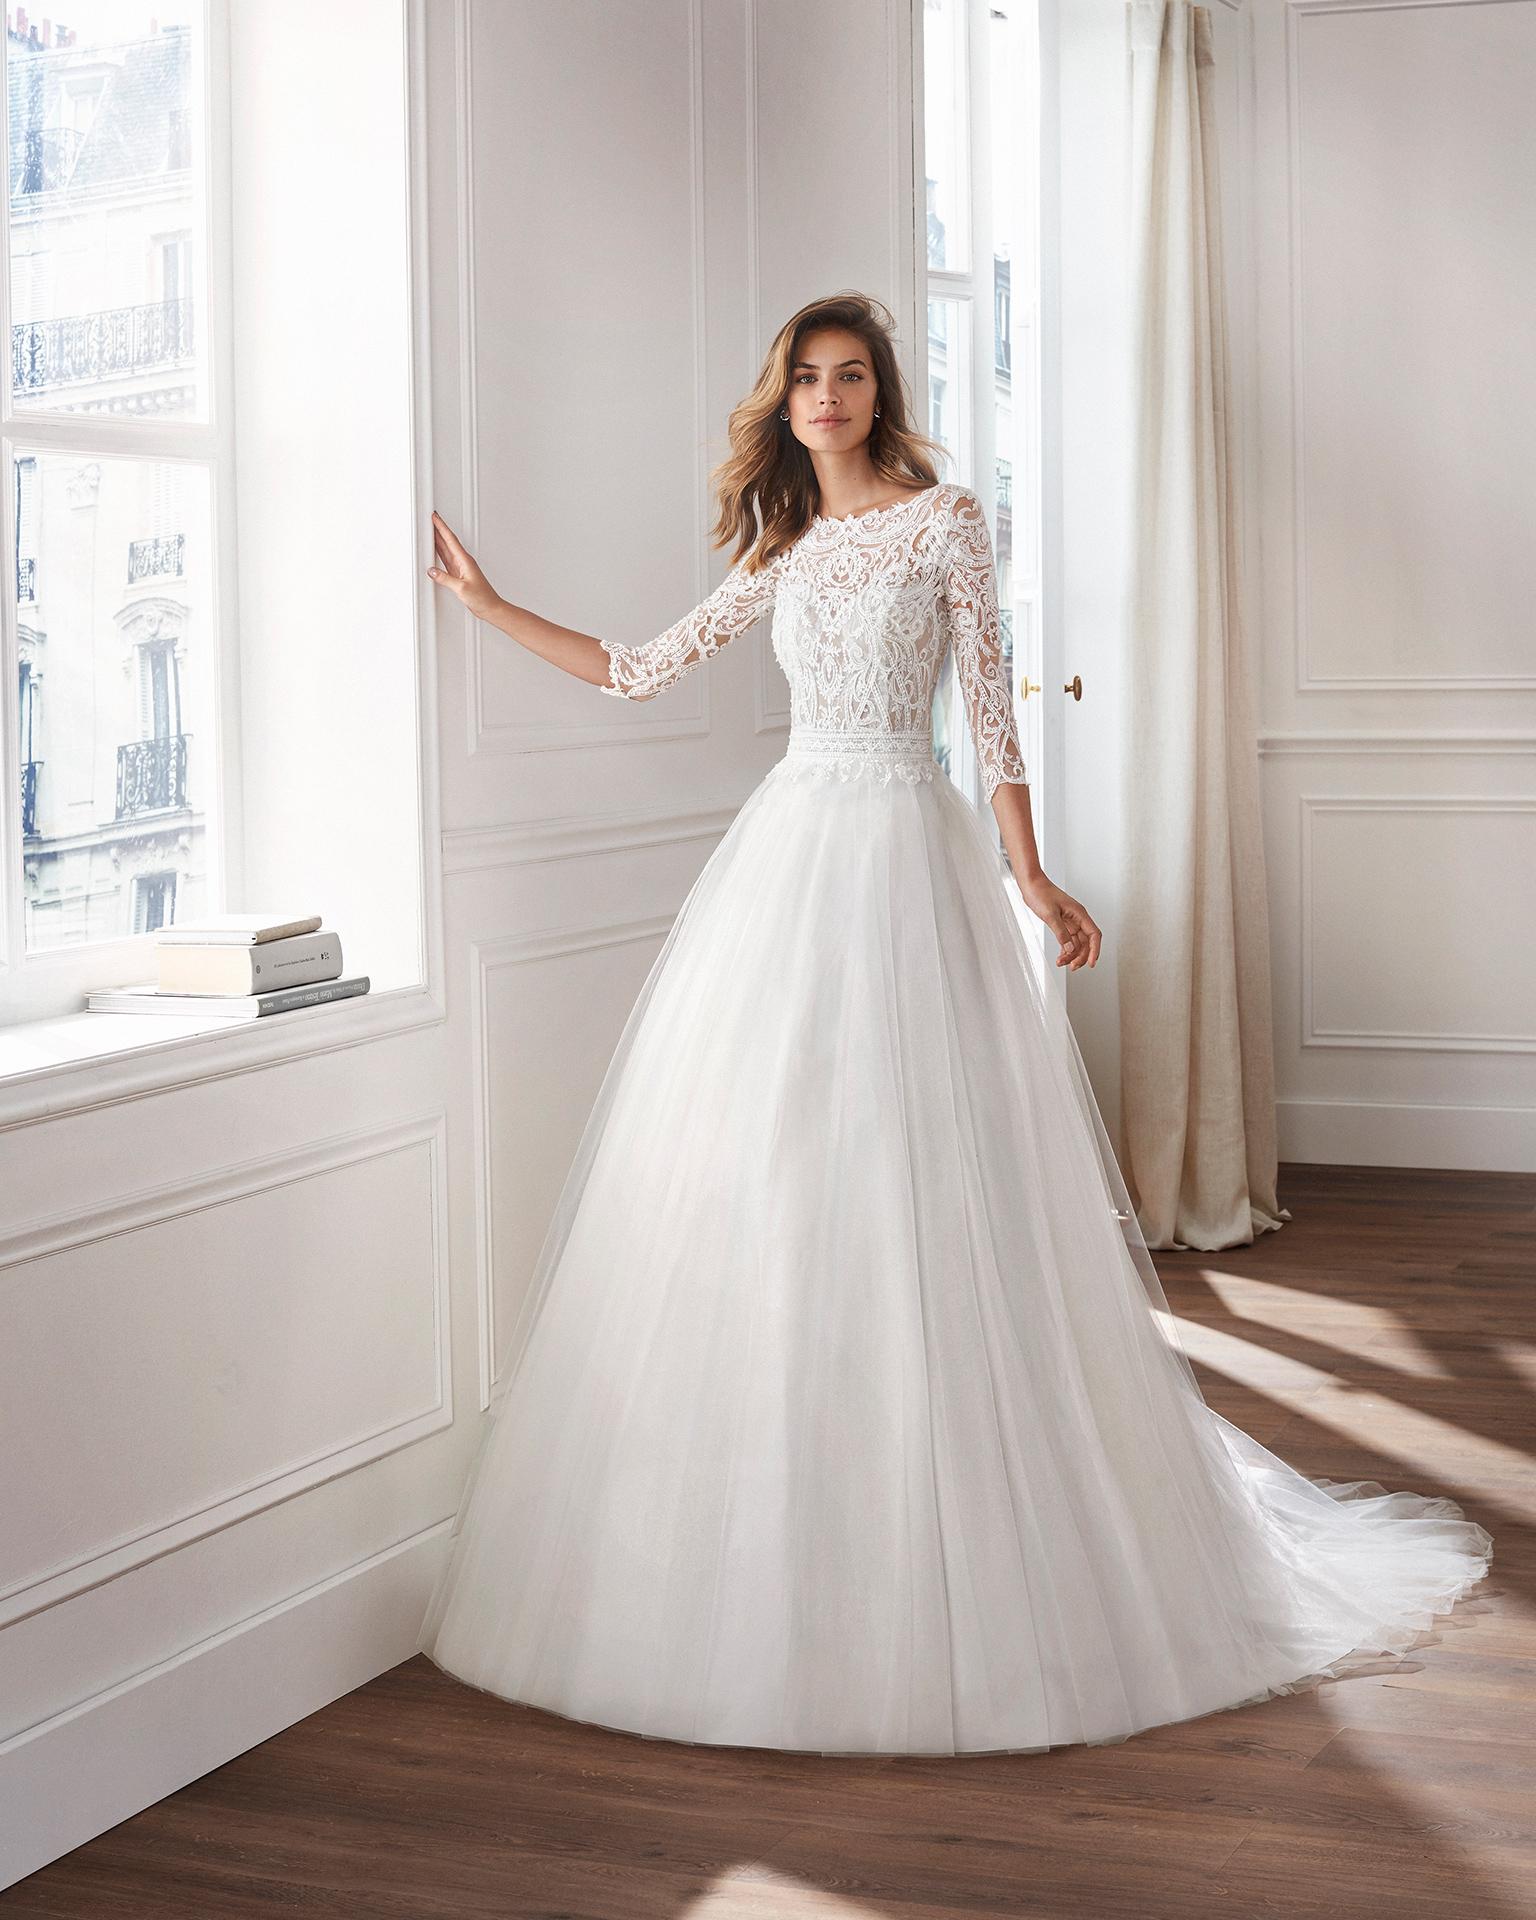 Vestido novia corte princesa 2019